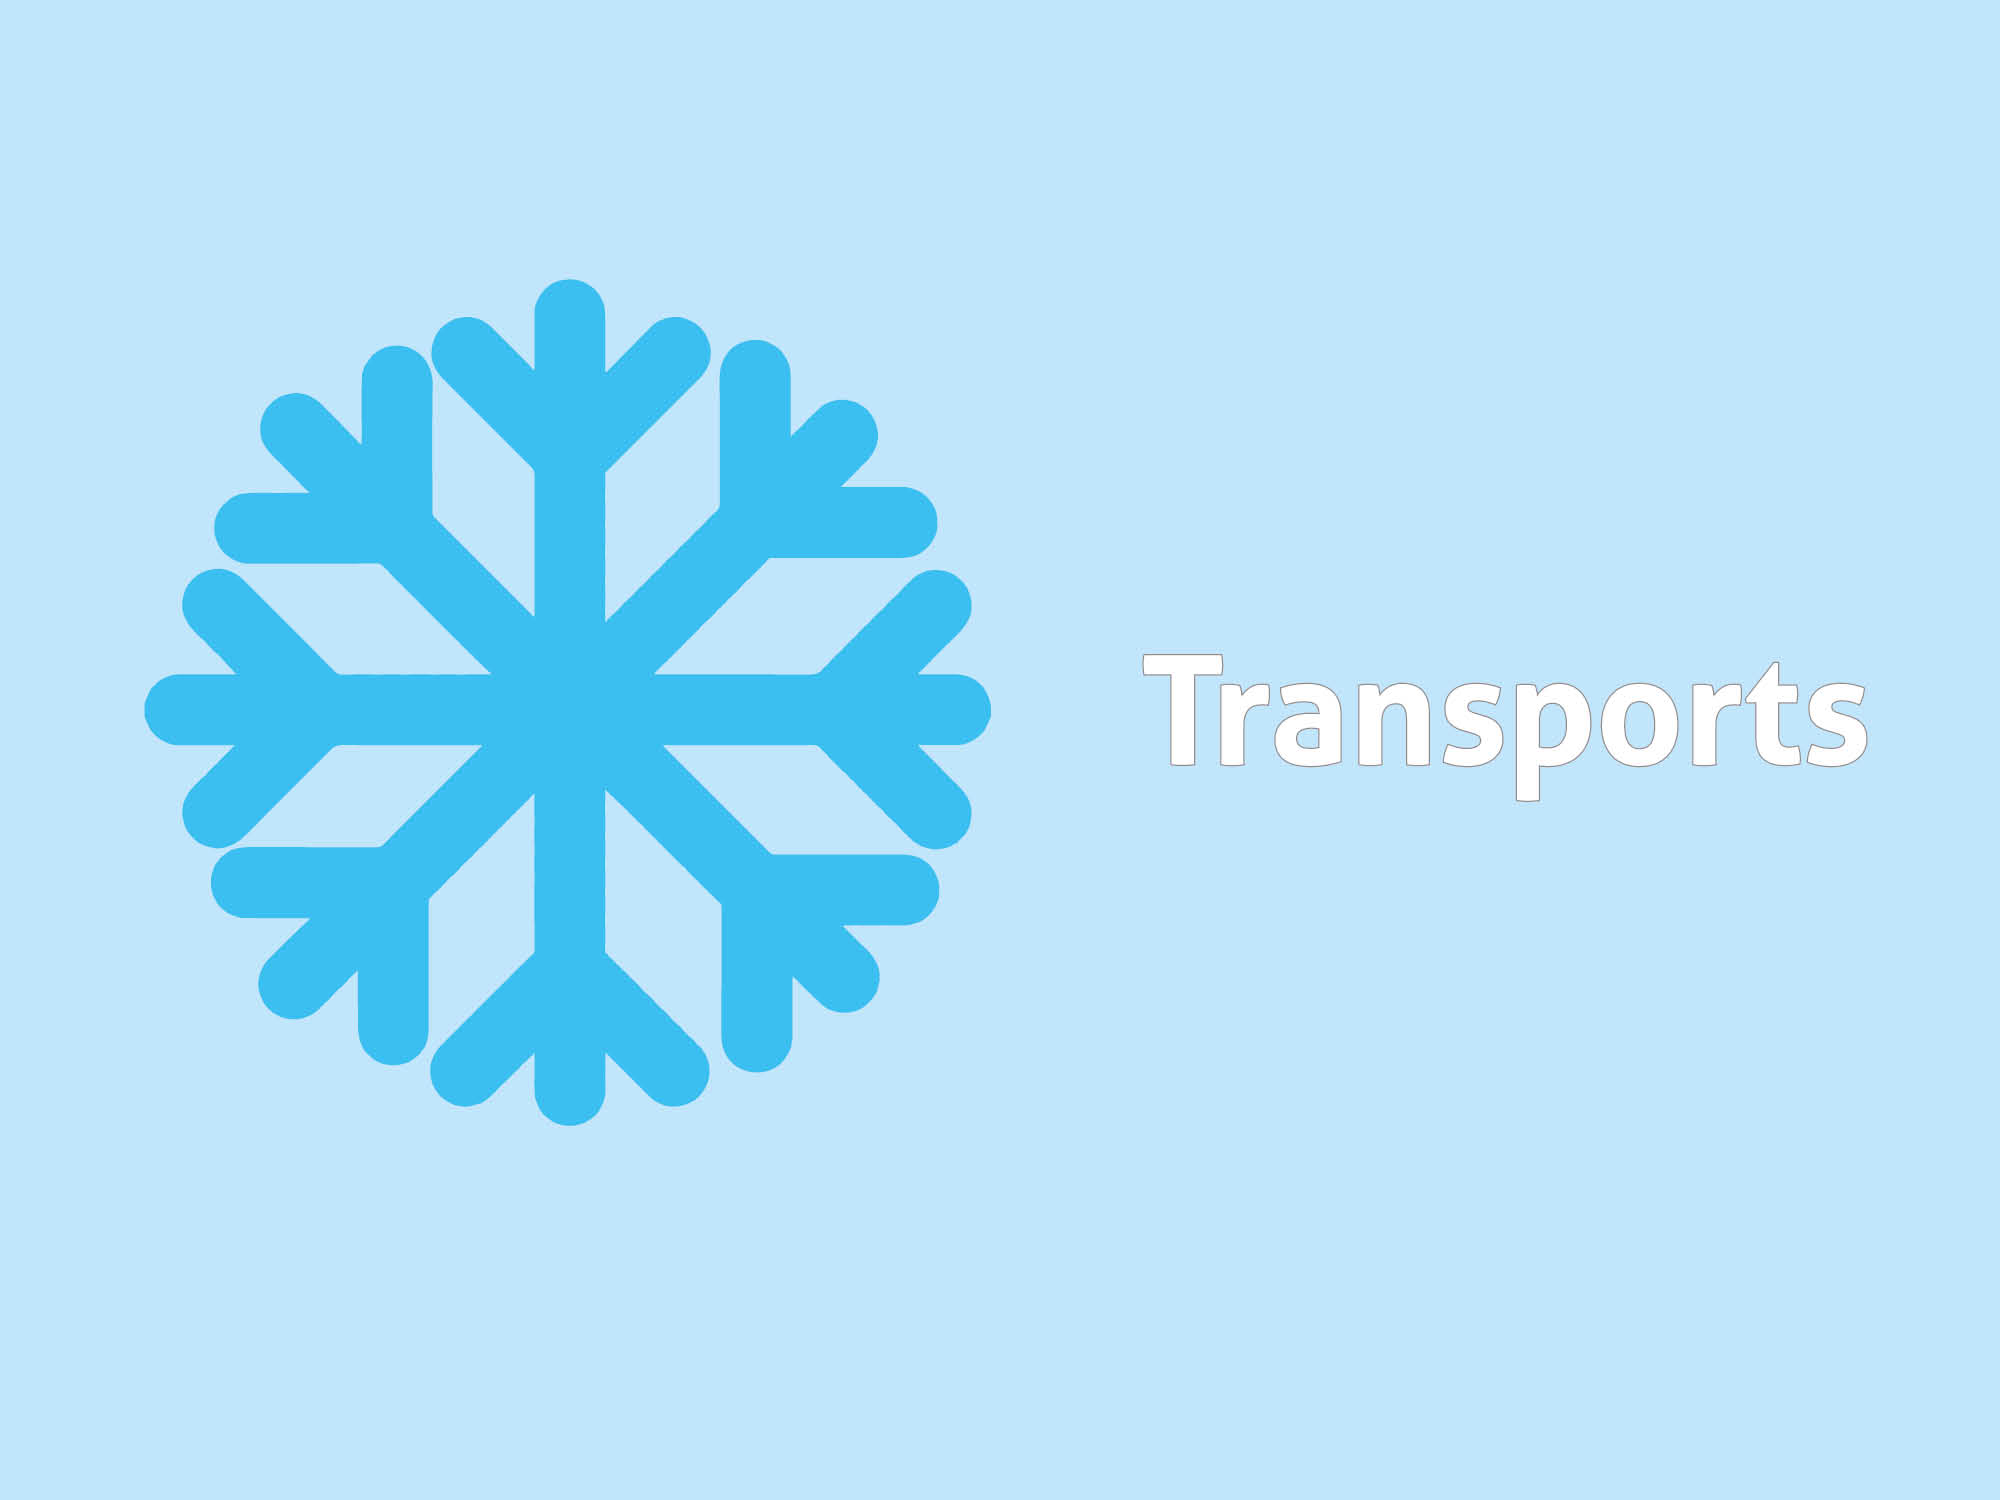 neige transports